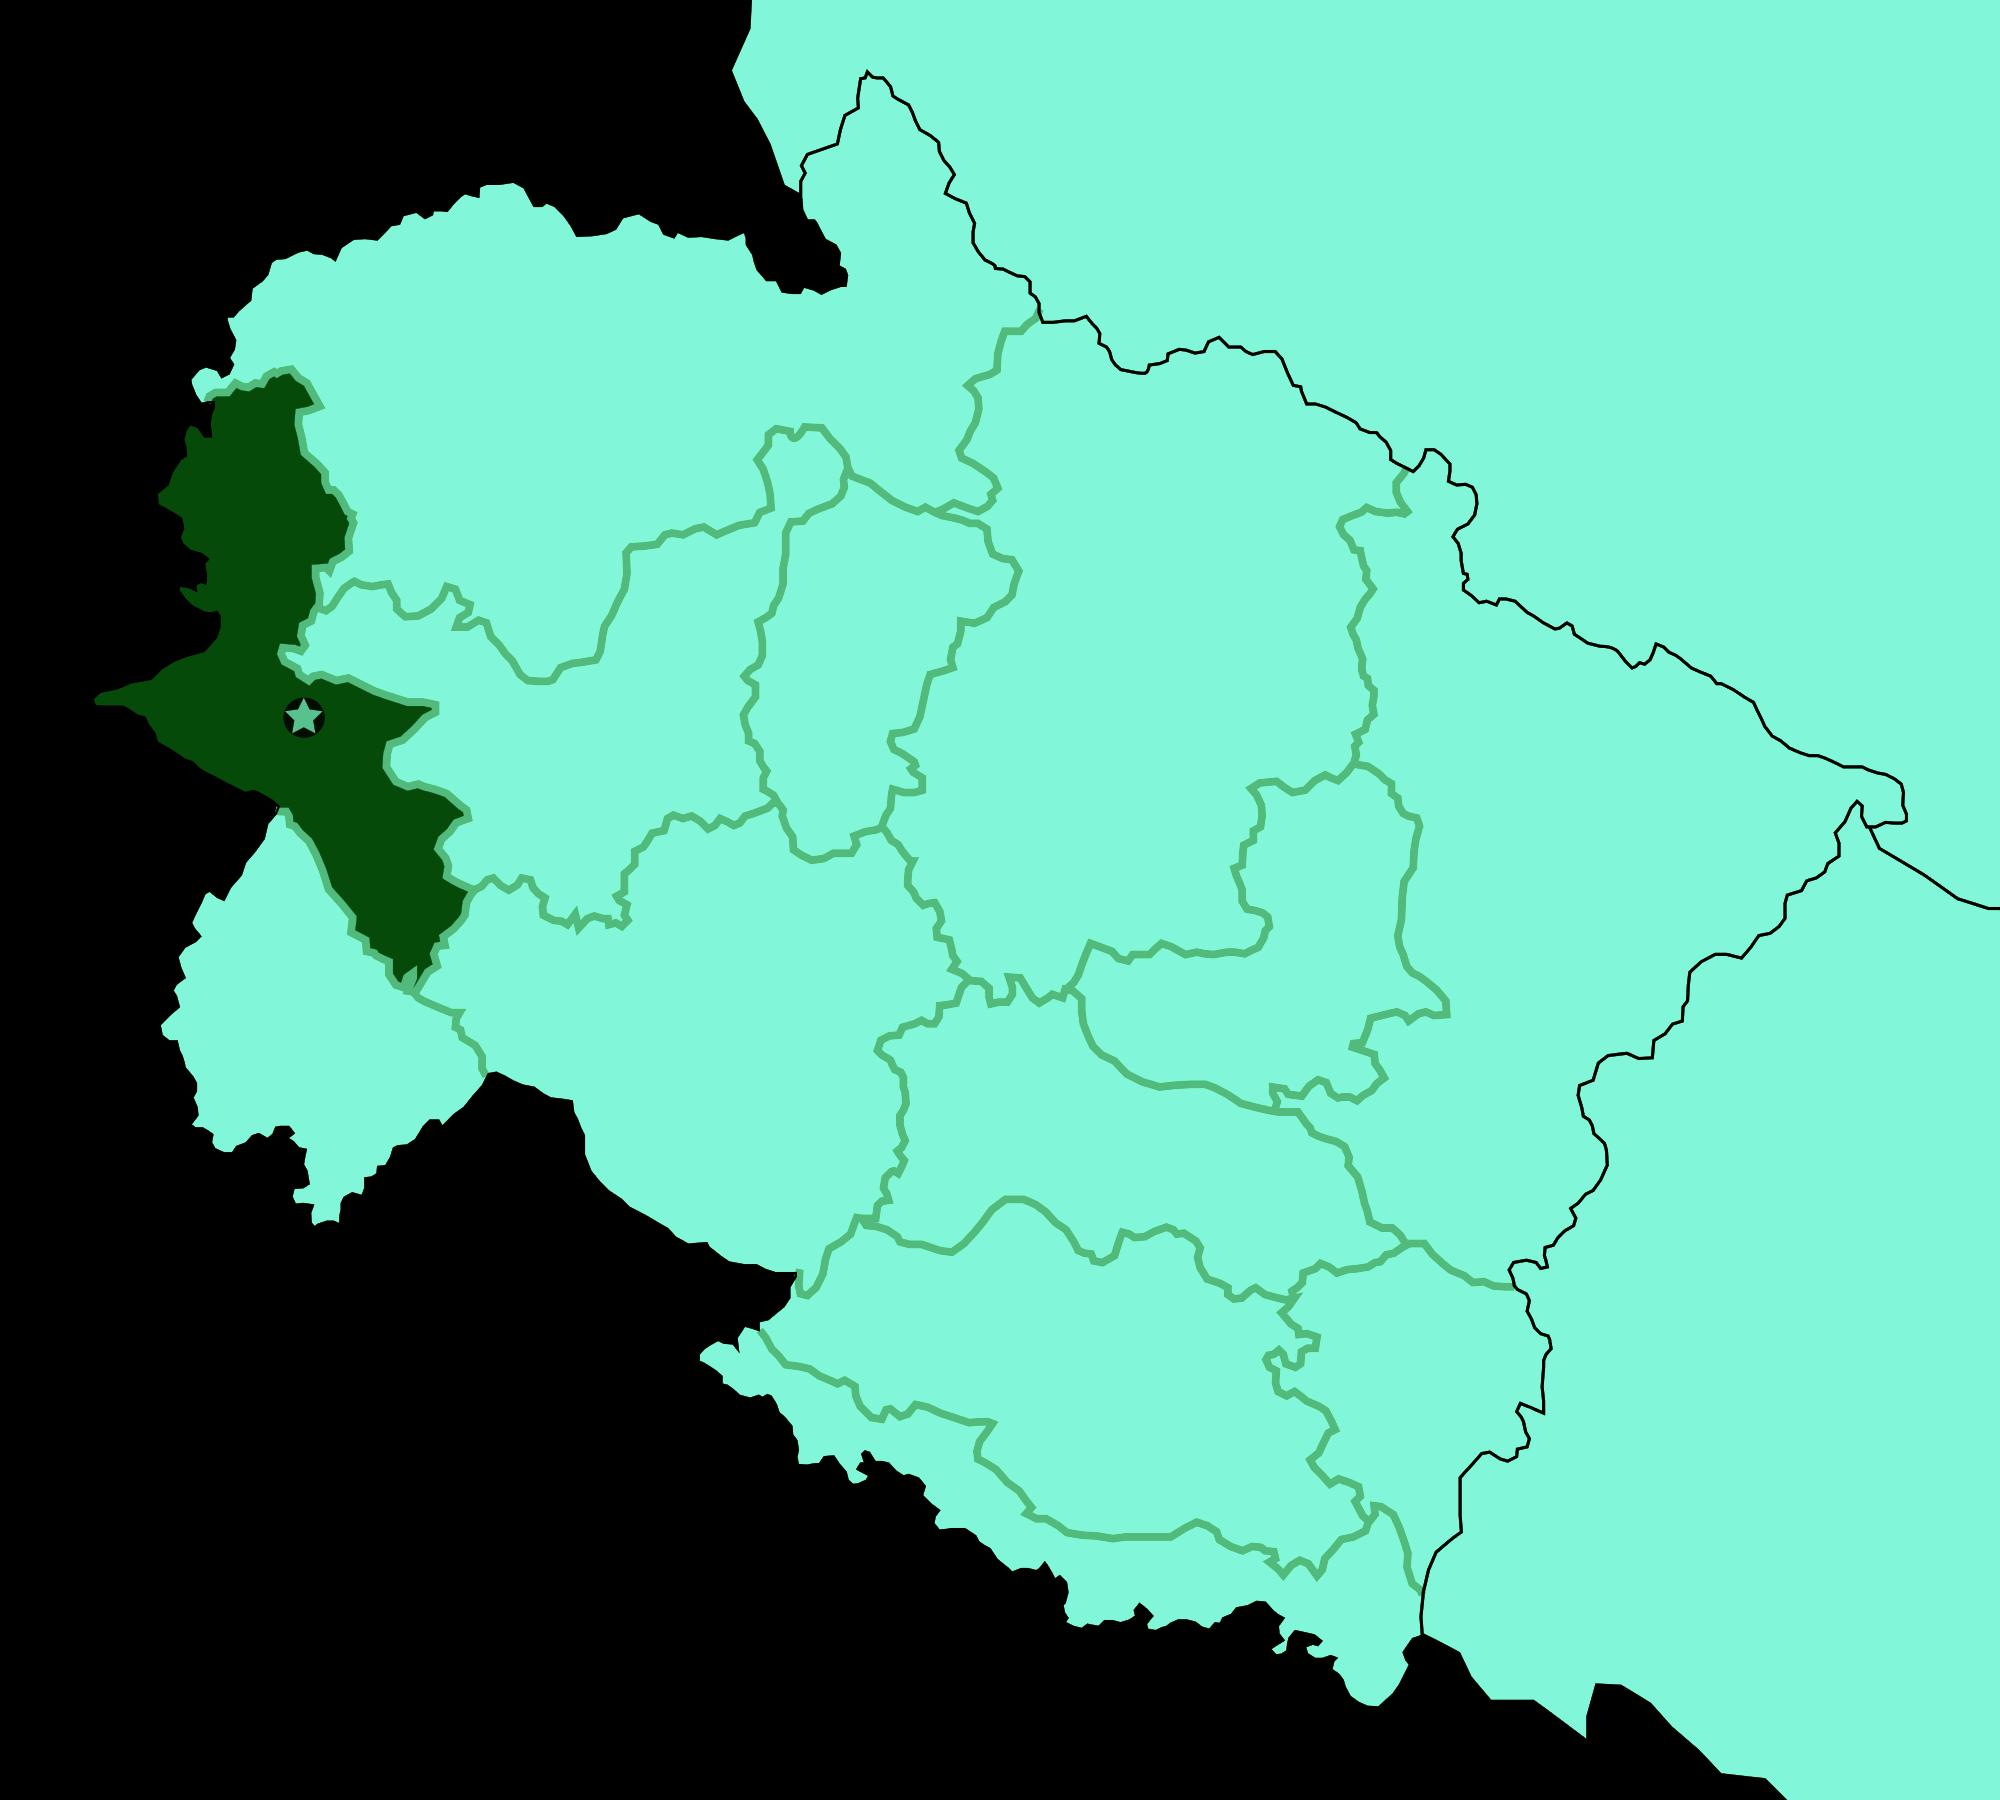 Download Map - Uttarakhand Map Outline - Full Size PNG Image ...